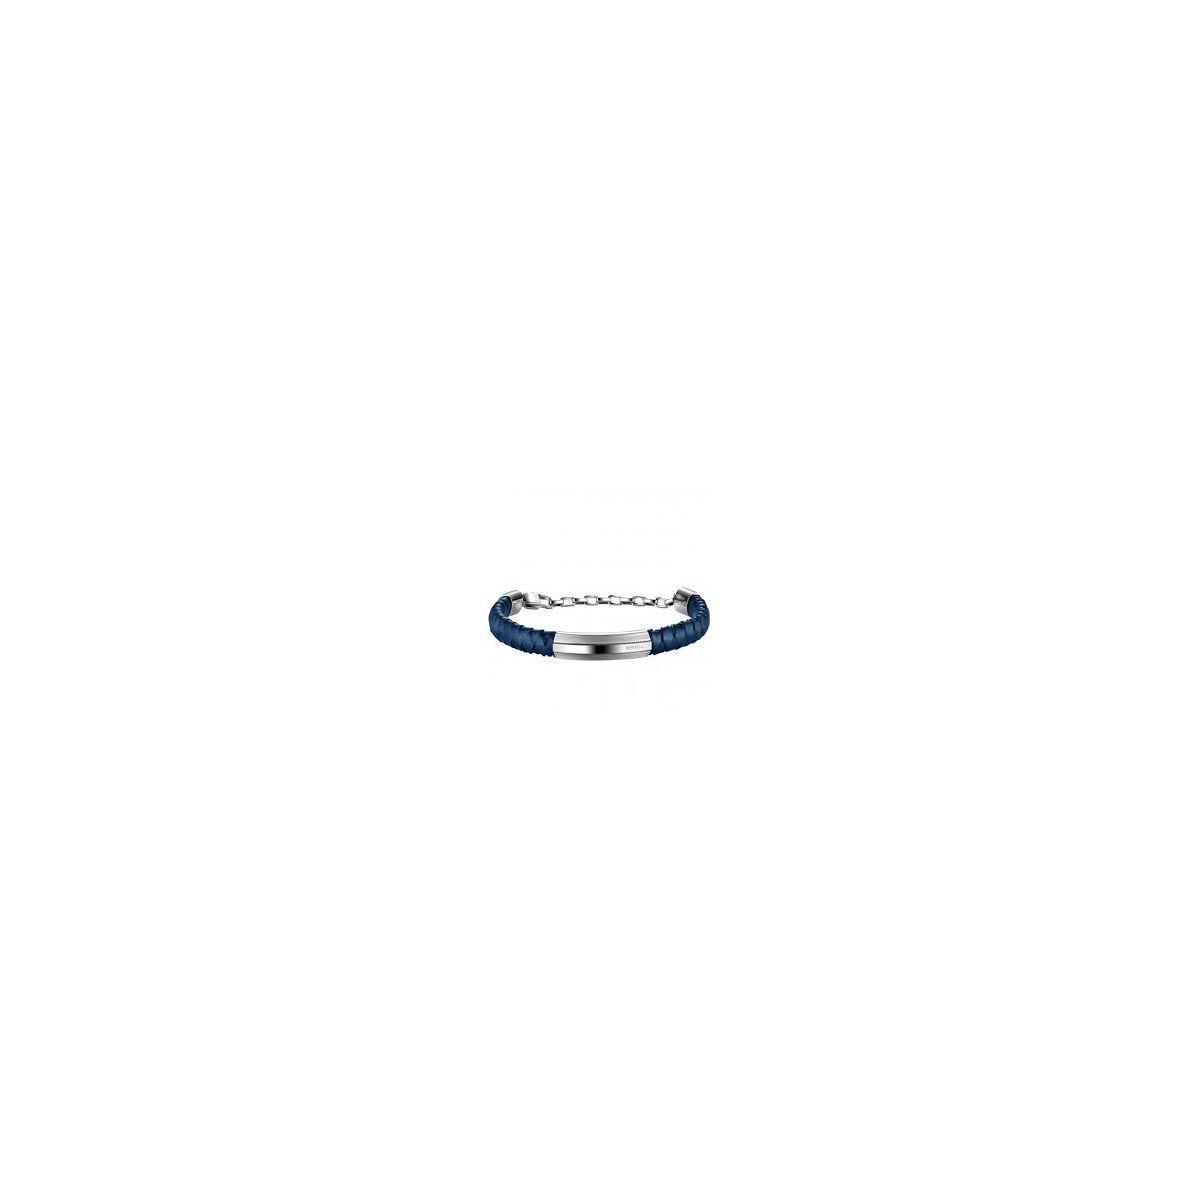 BRACCIALE UOMO GIOIELLI BREIL THORN TJ1763